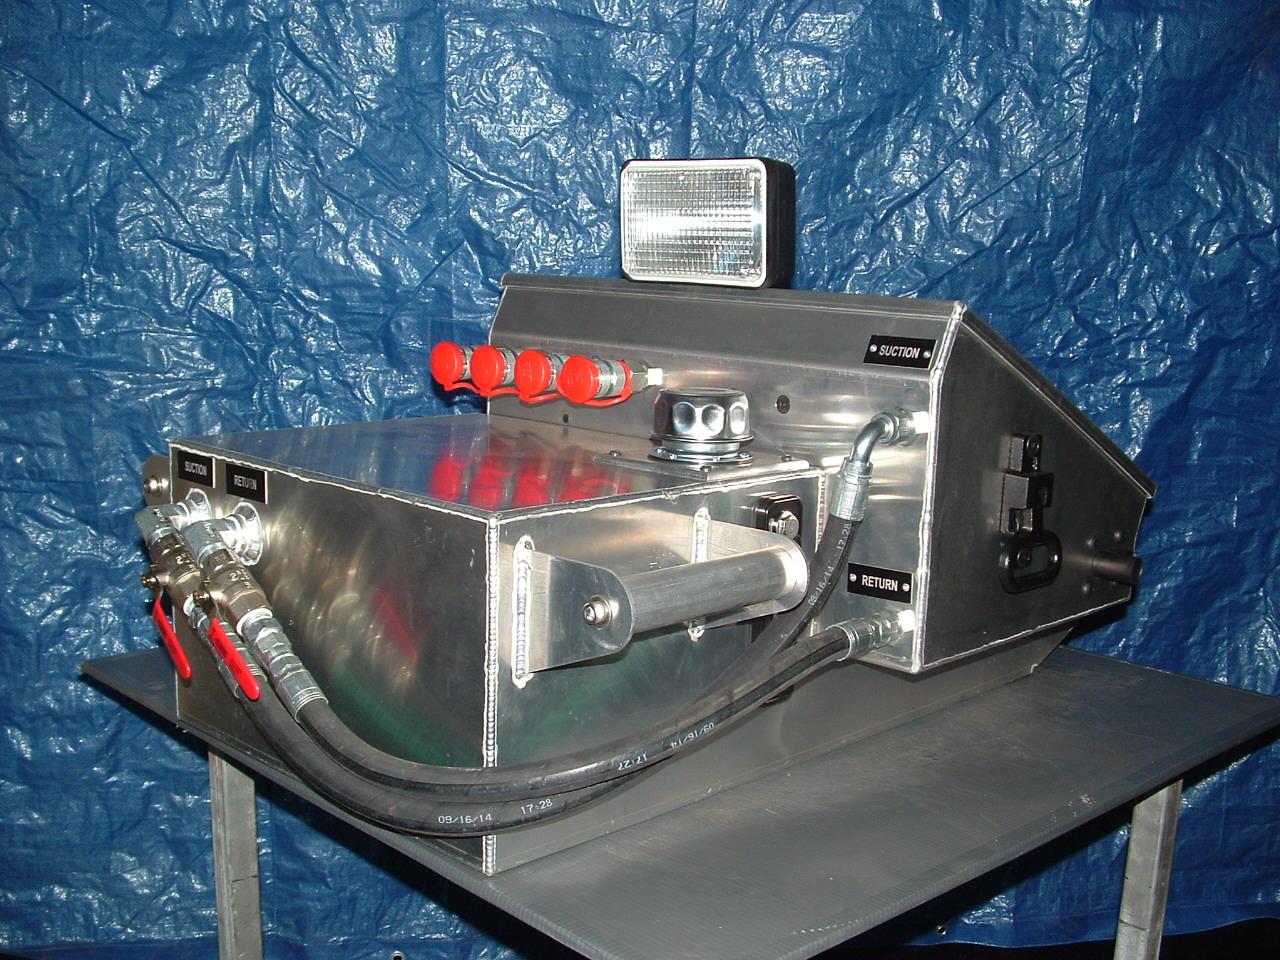 Funky Delta Valve Photo - Bathtub Design Ideas - klotsnet.com